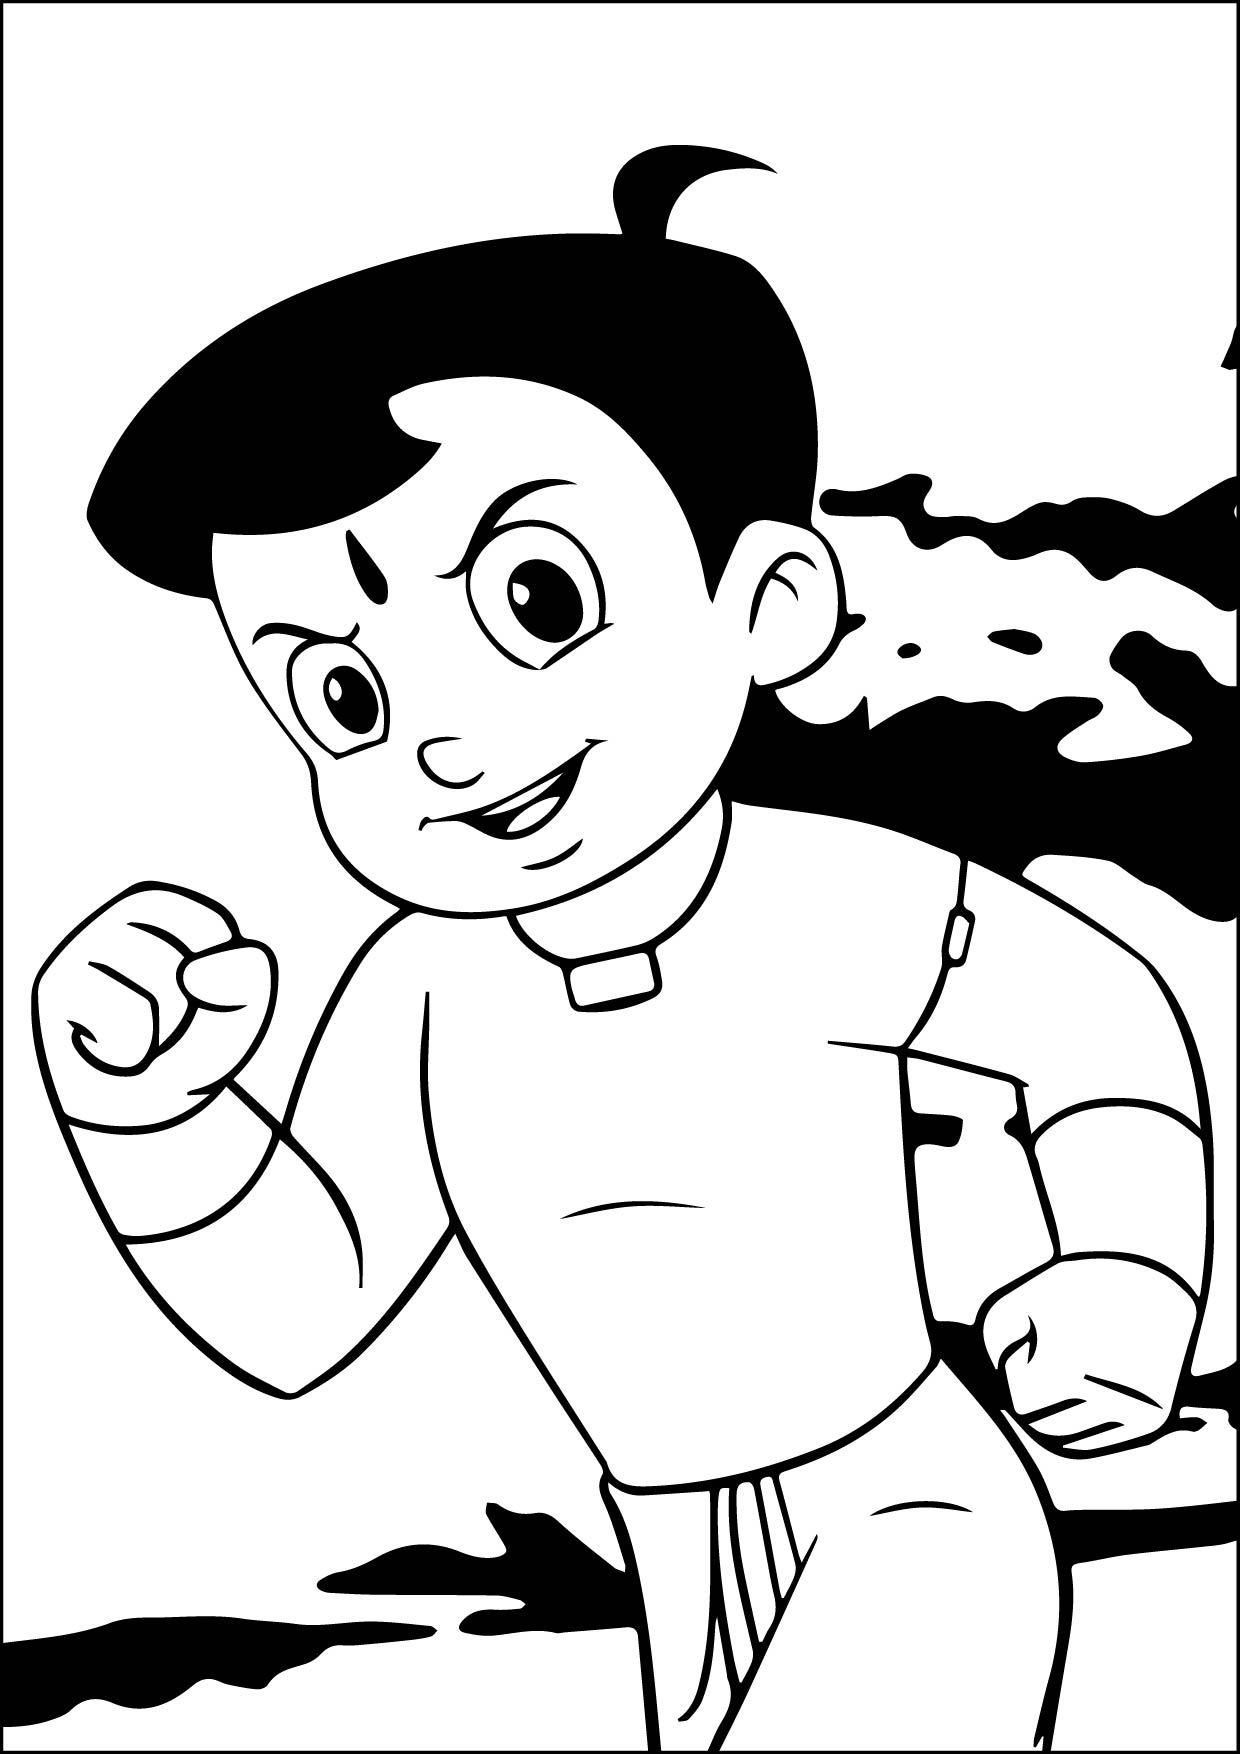 Chhota Bheem Coloring Pages Games. Chhota Bheem Coloring Pages  wecoloringpage Pinterest Check